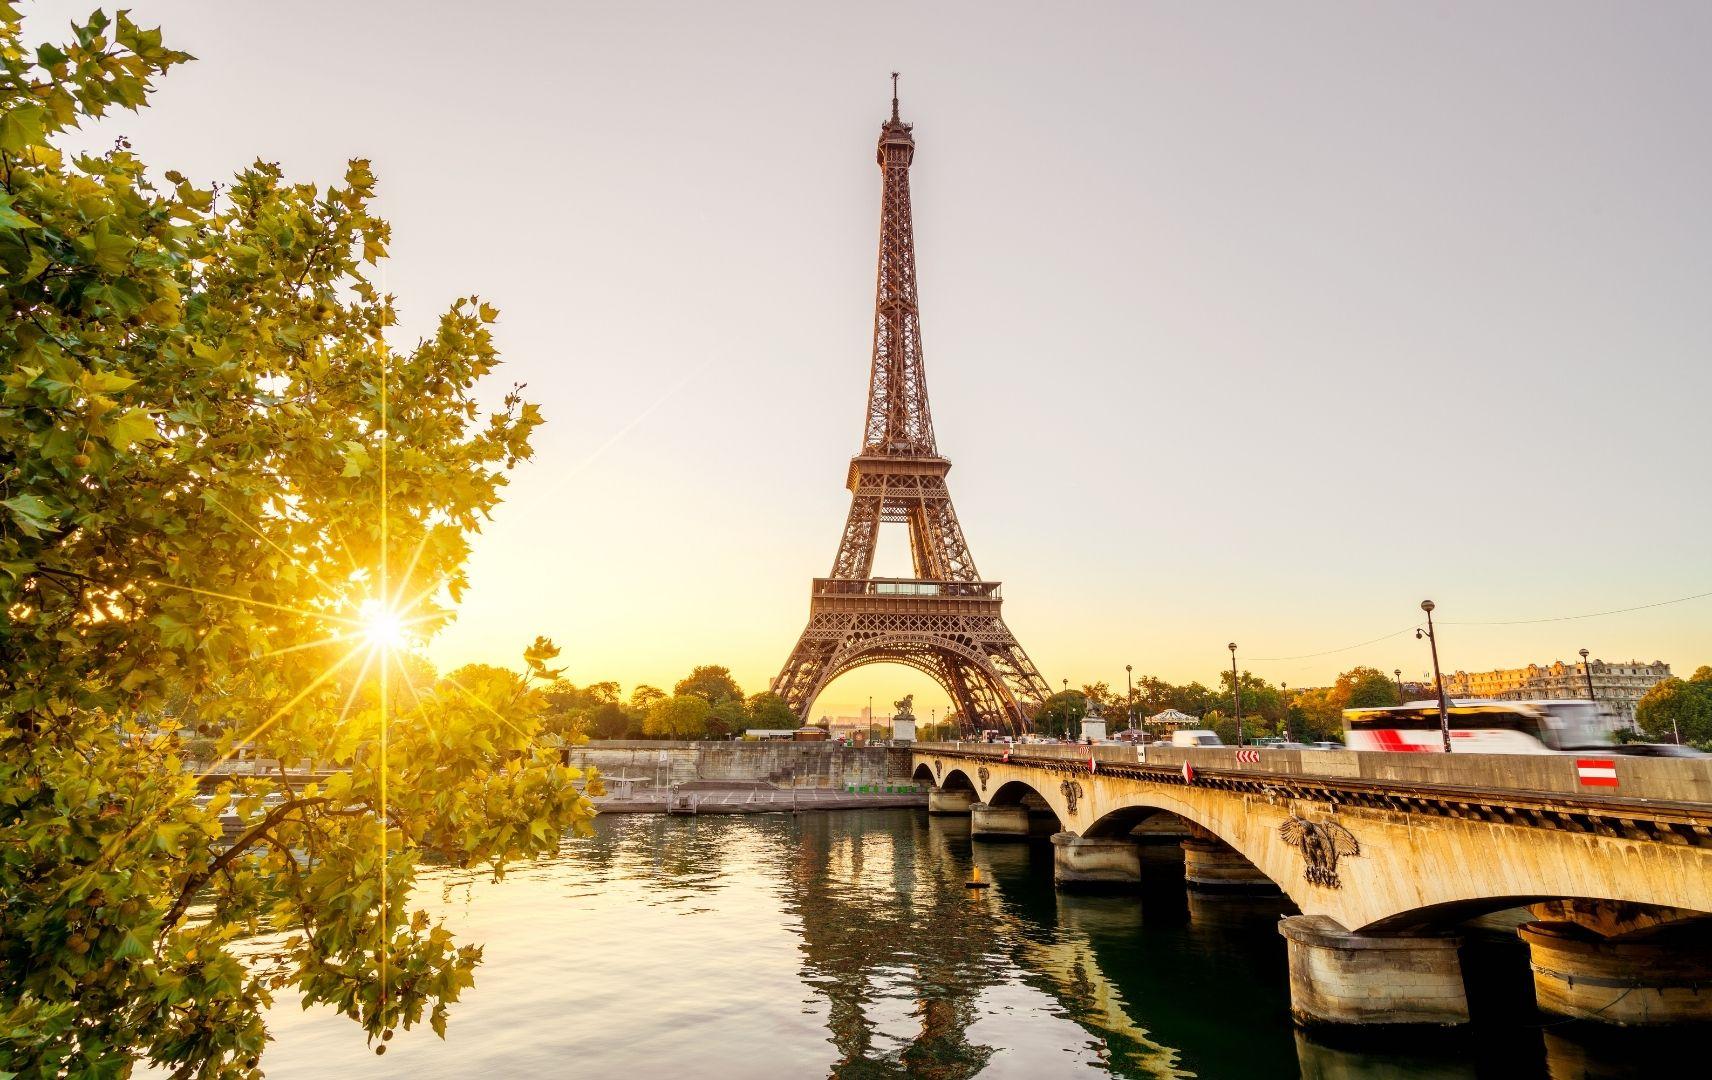 Frankreich - Paris, Eifelturm